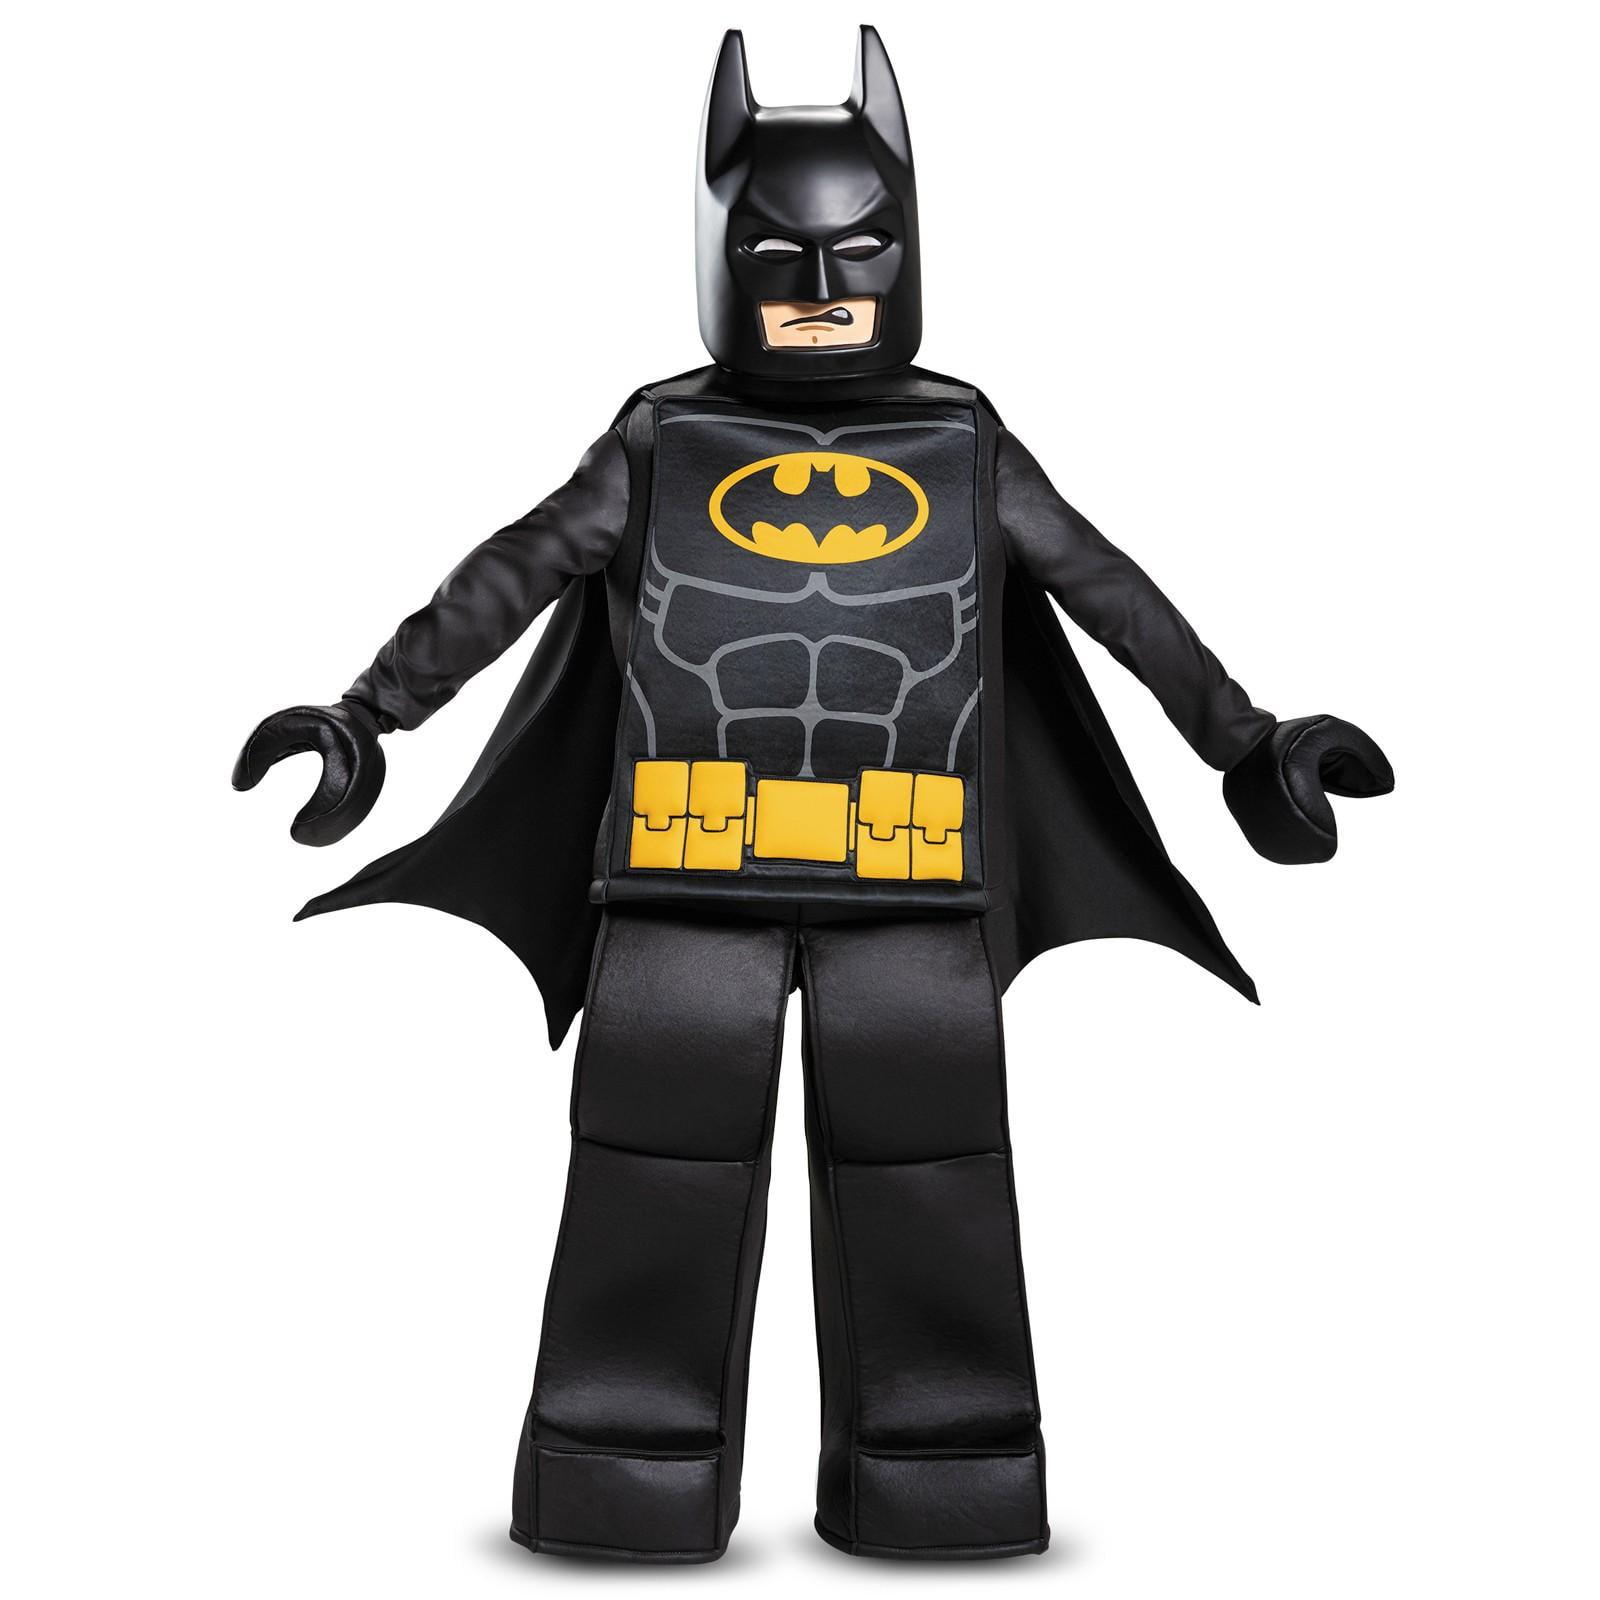 sc 1 st  Walmart & BATMAN LEGO PRESTIGE - Walmart.com